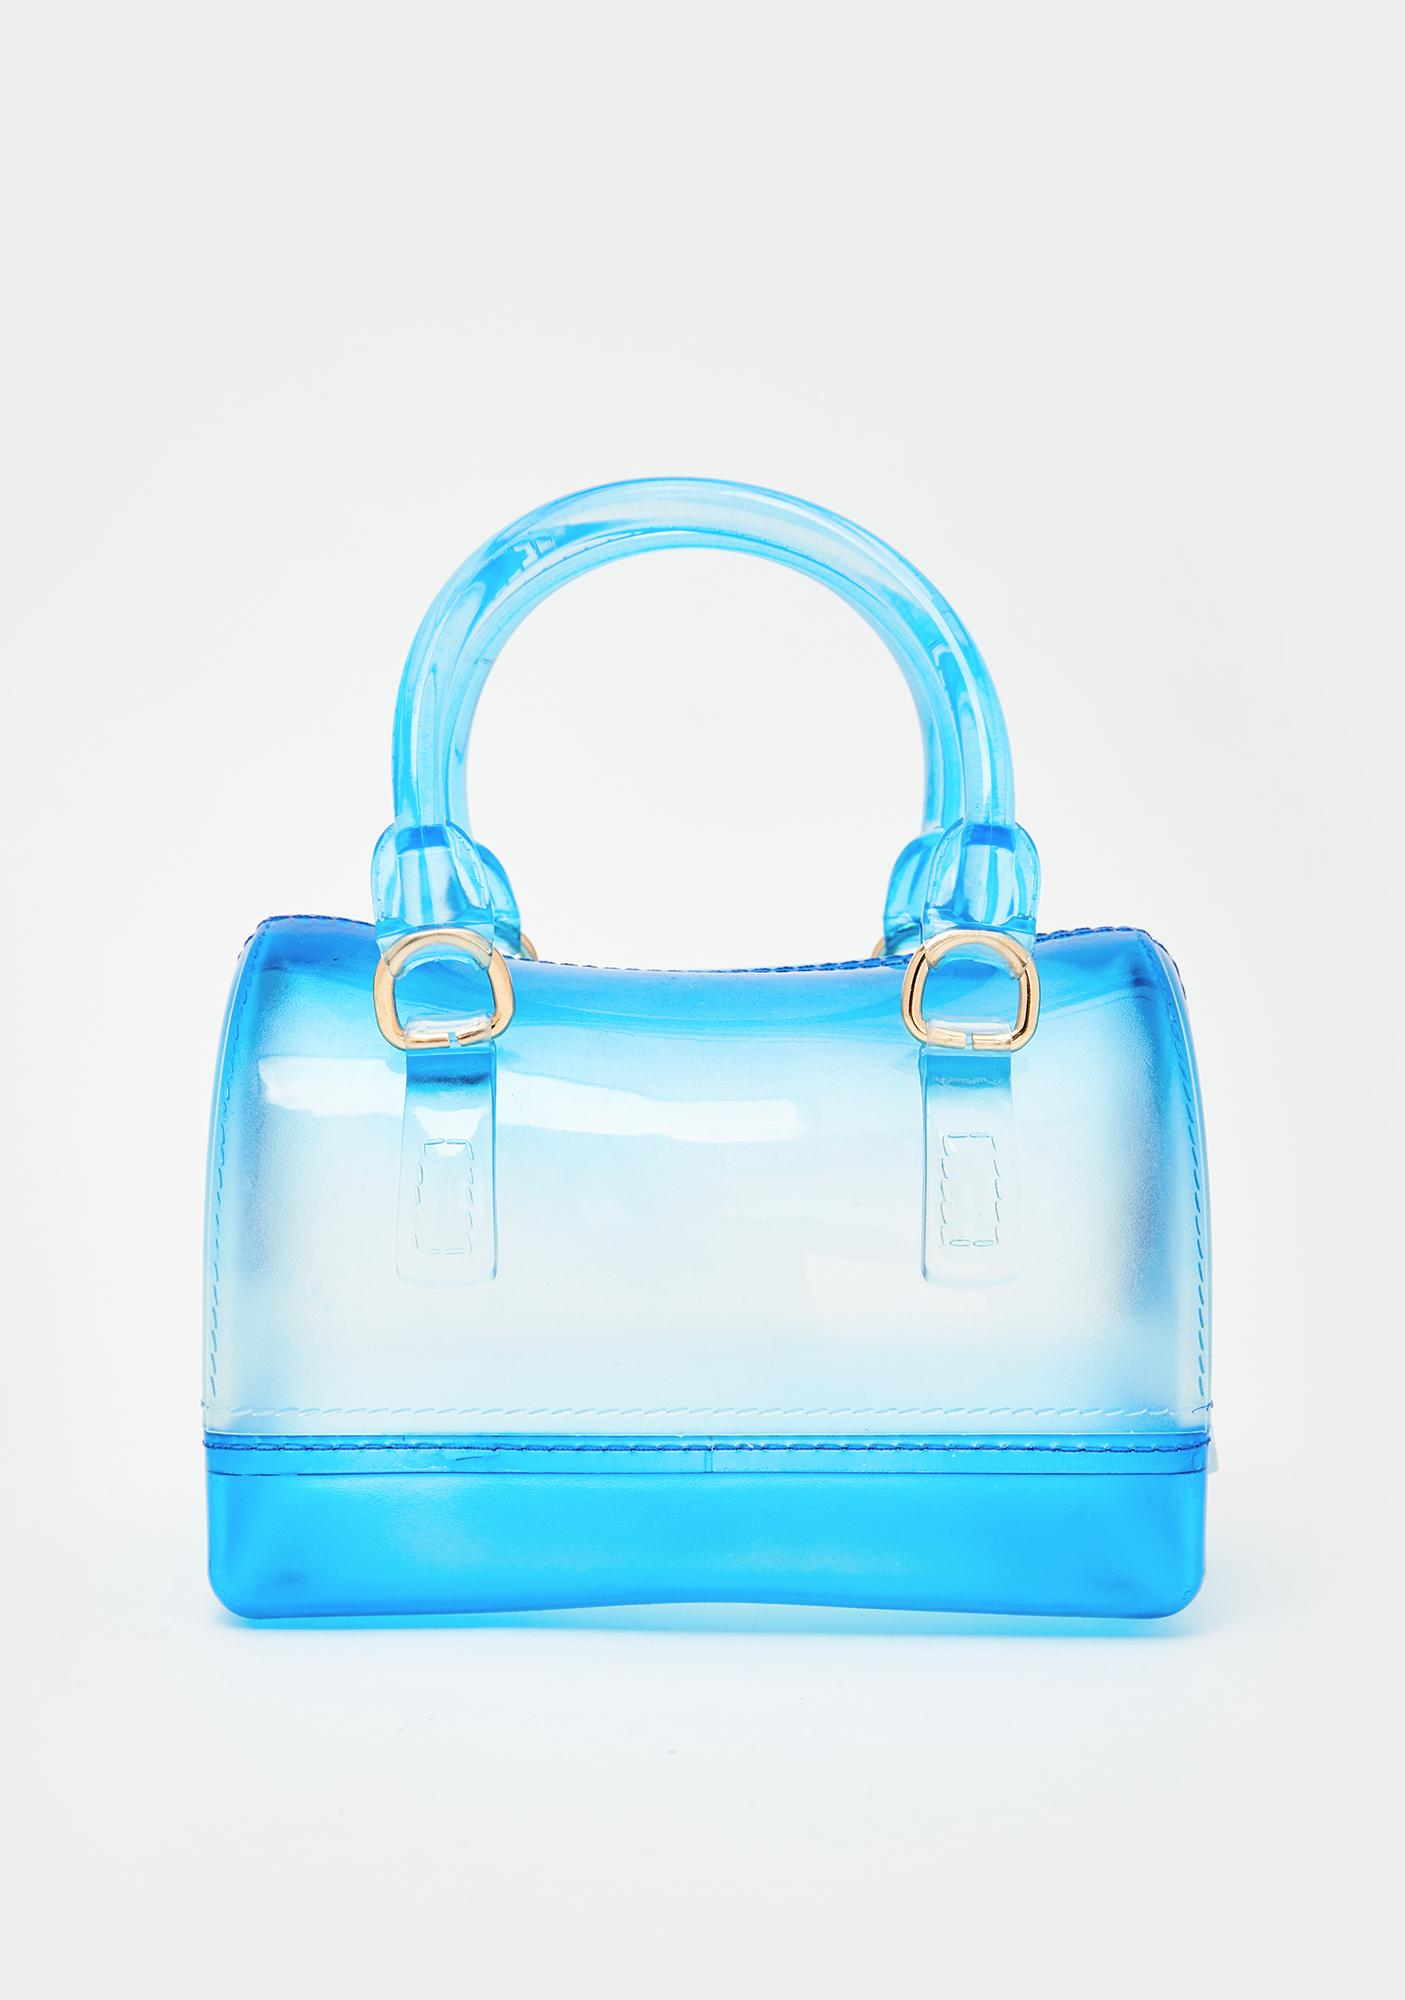 Let 'Em Look Transparent Handbag